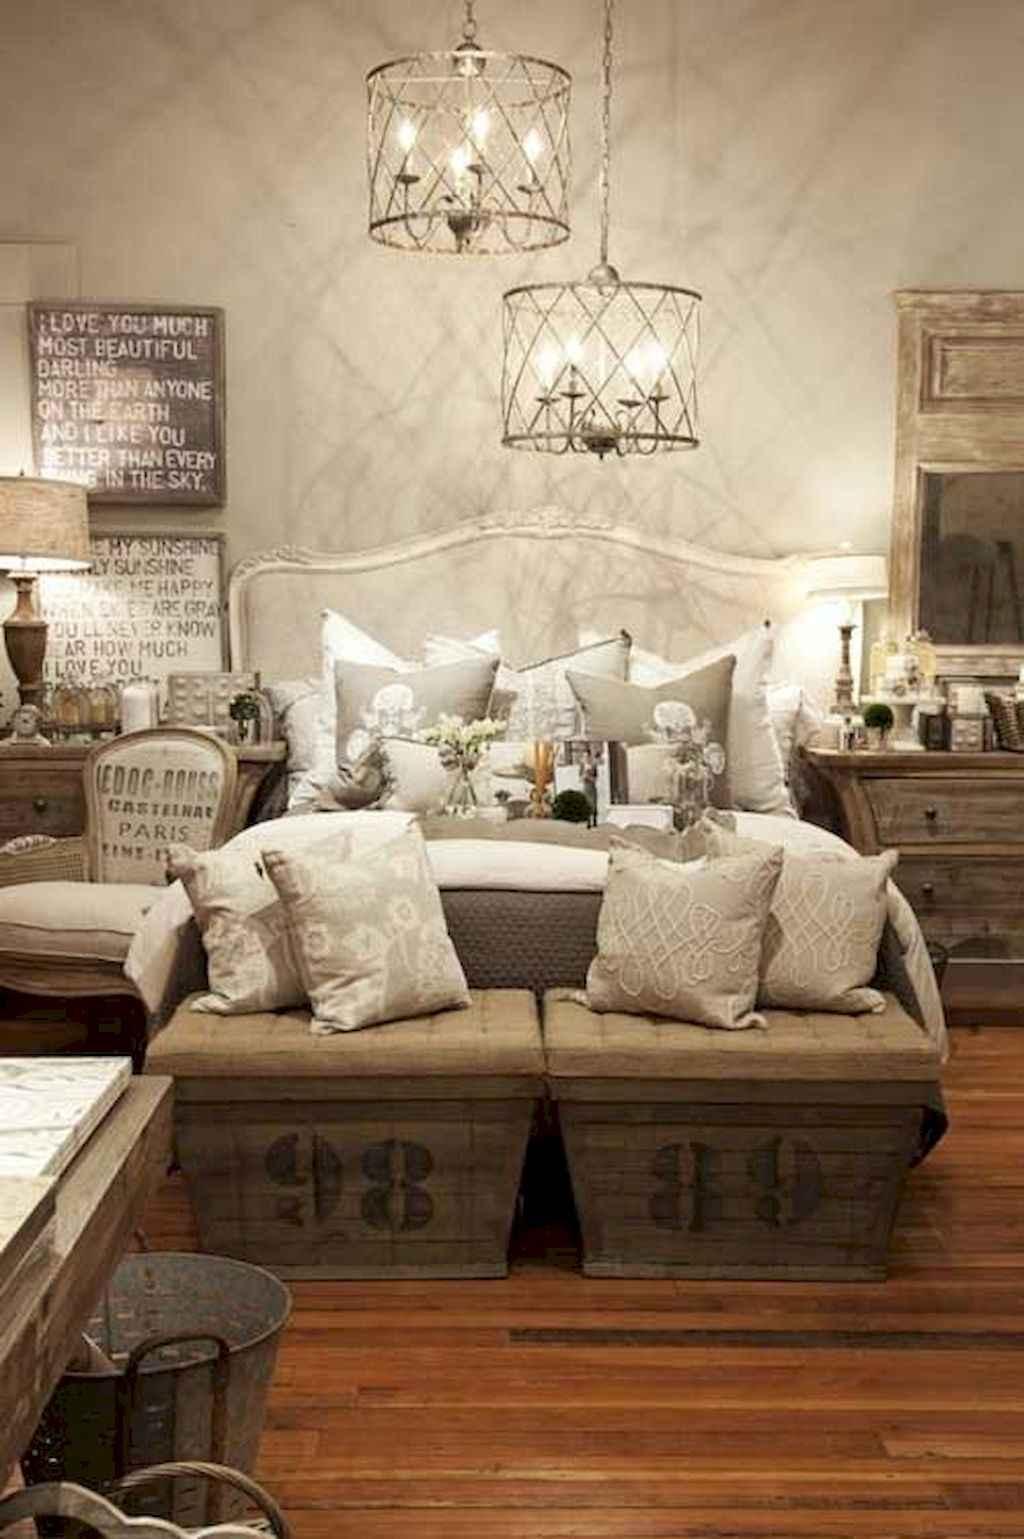 Gorgeous rustic master bedroom design & decor ideas (42)